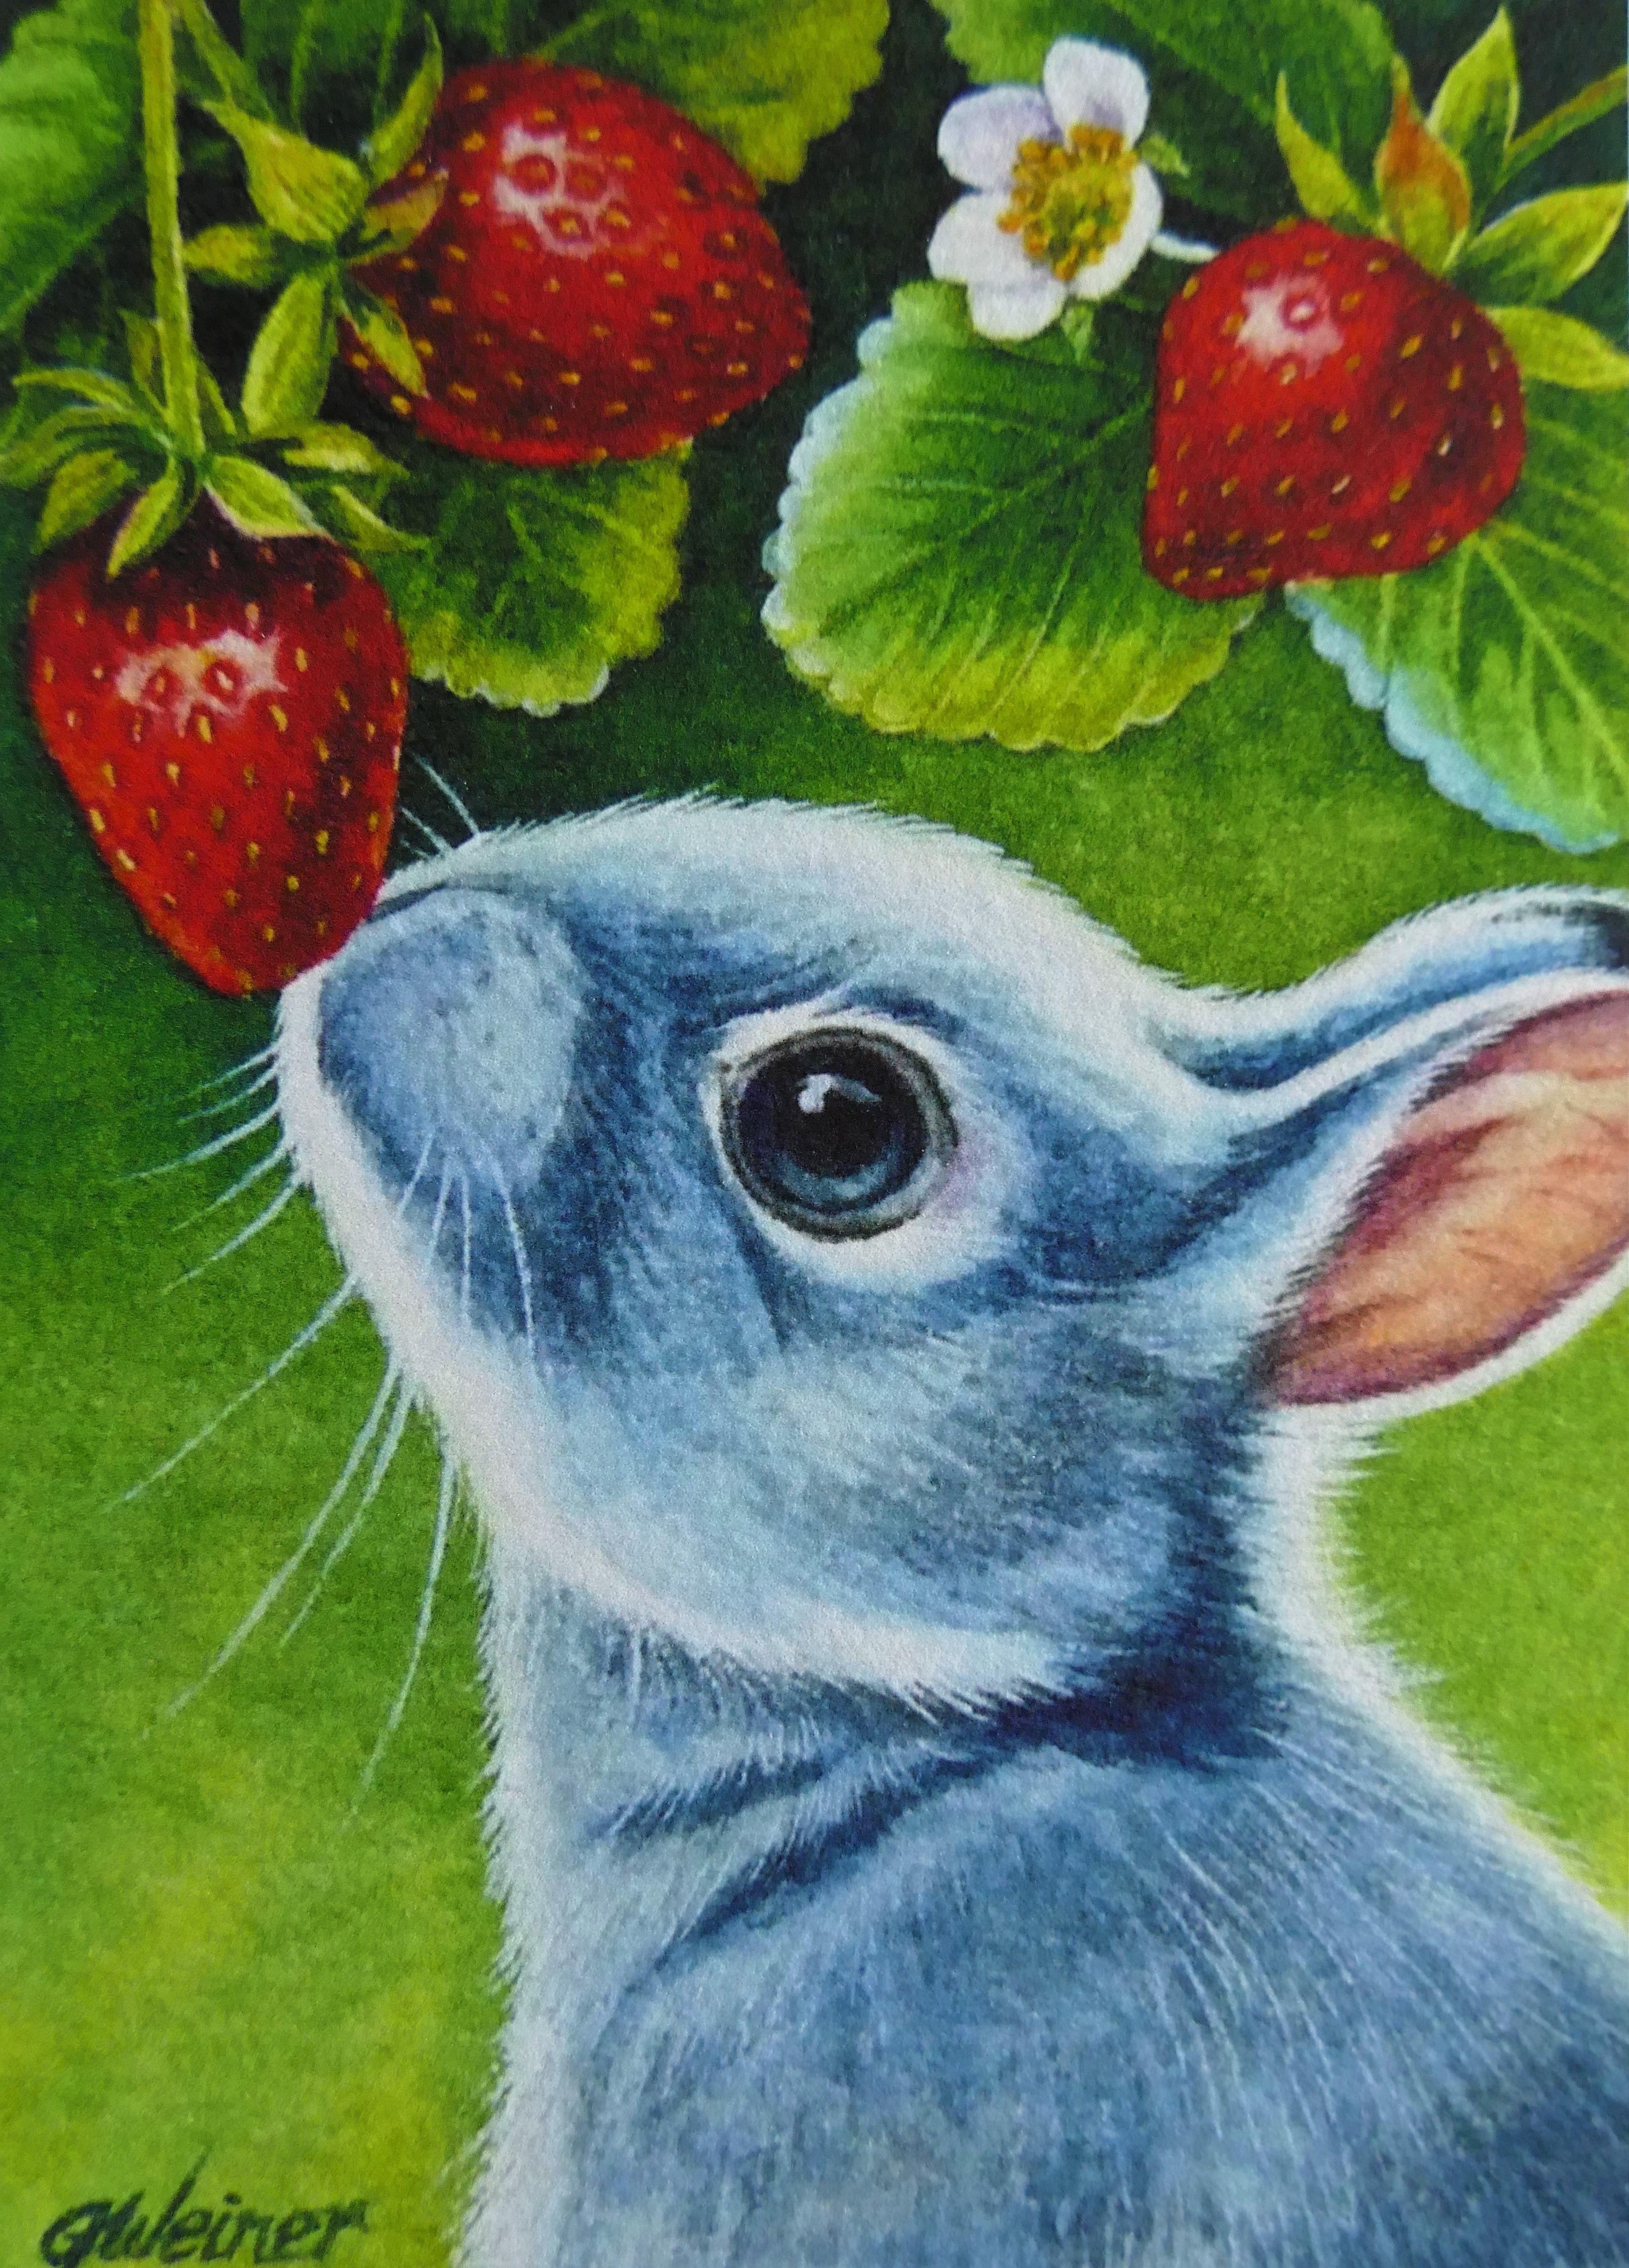 Pin on Bunny Rabbit Greetings